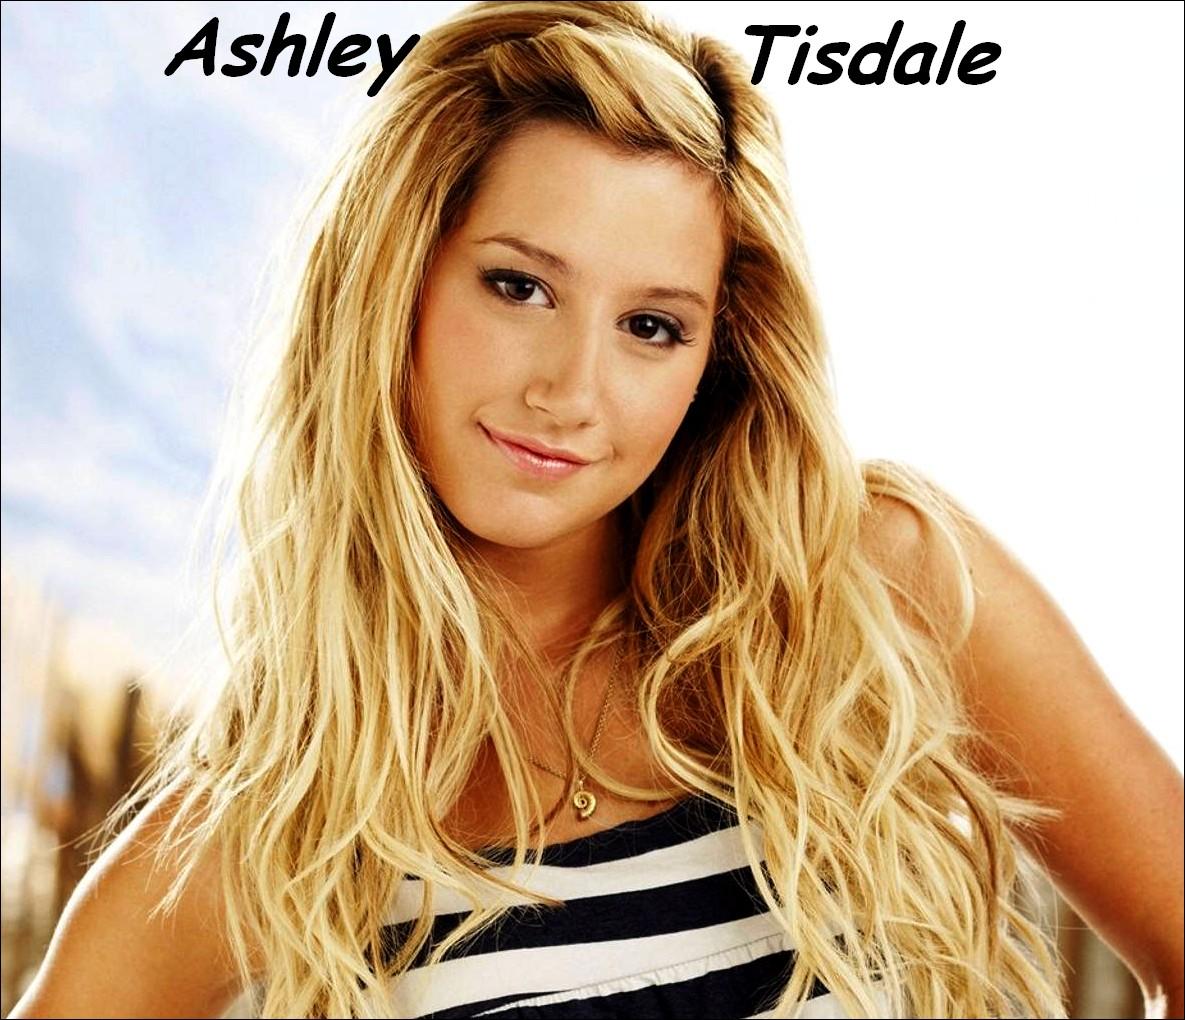 http://2.bp.blogspot.com/-2MgTxoTvQP0/T9dswXo7DpI/AAAAAAAAAII/pxb9kZKVnZc/s1600/AshleyTisdale7.jpg